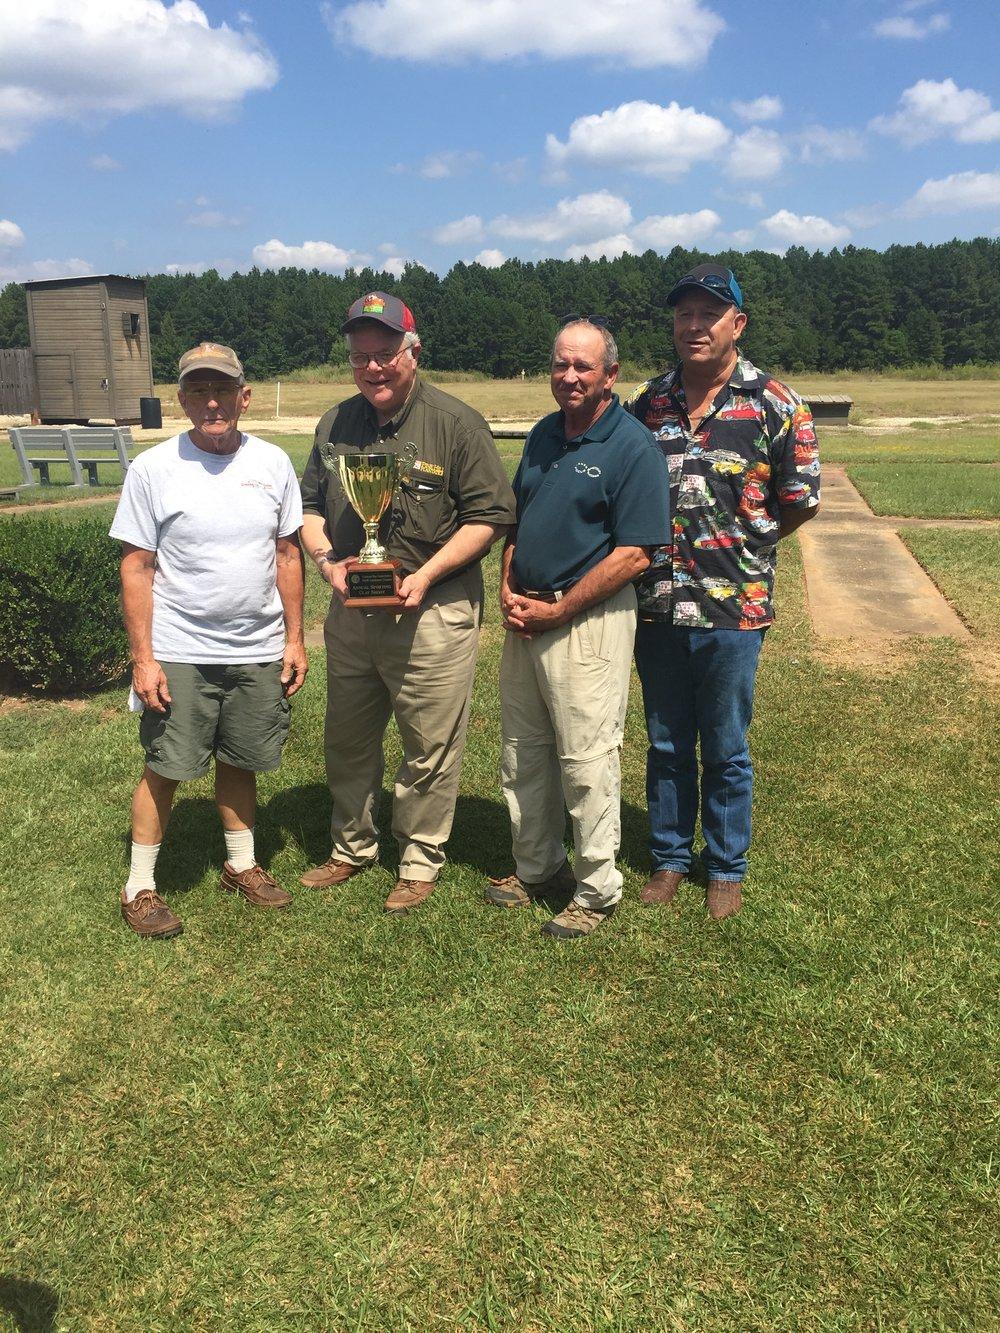 The 2017 Federal Bar Association Clay Shoot Winning Team